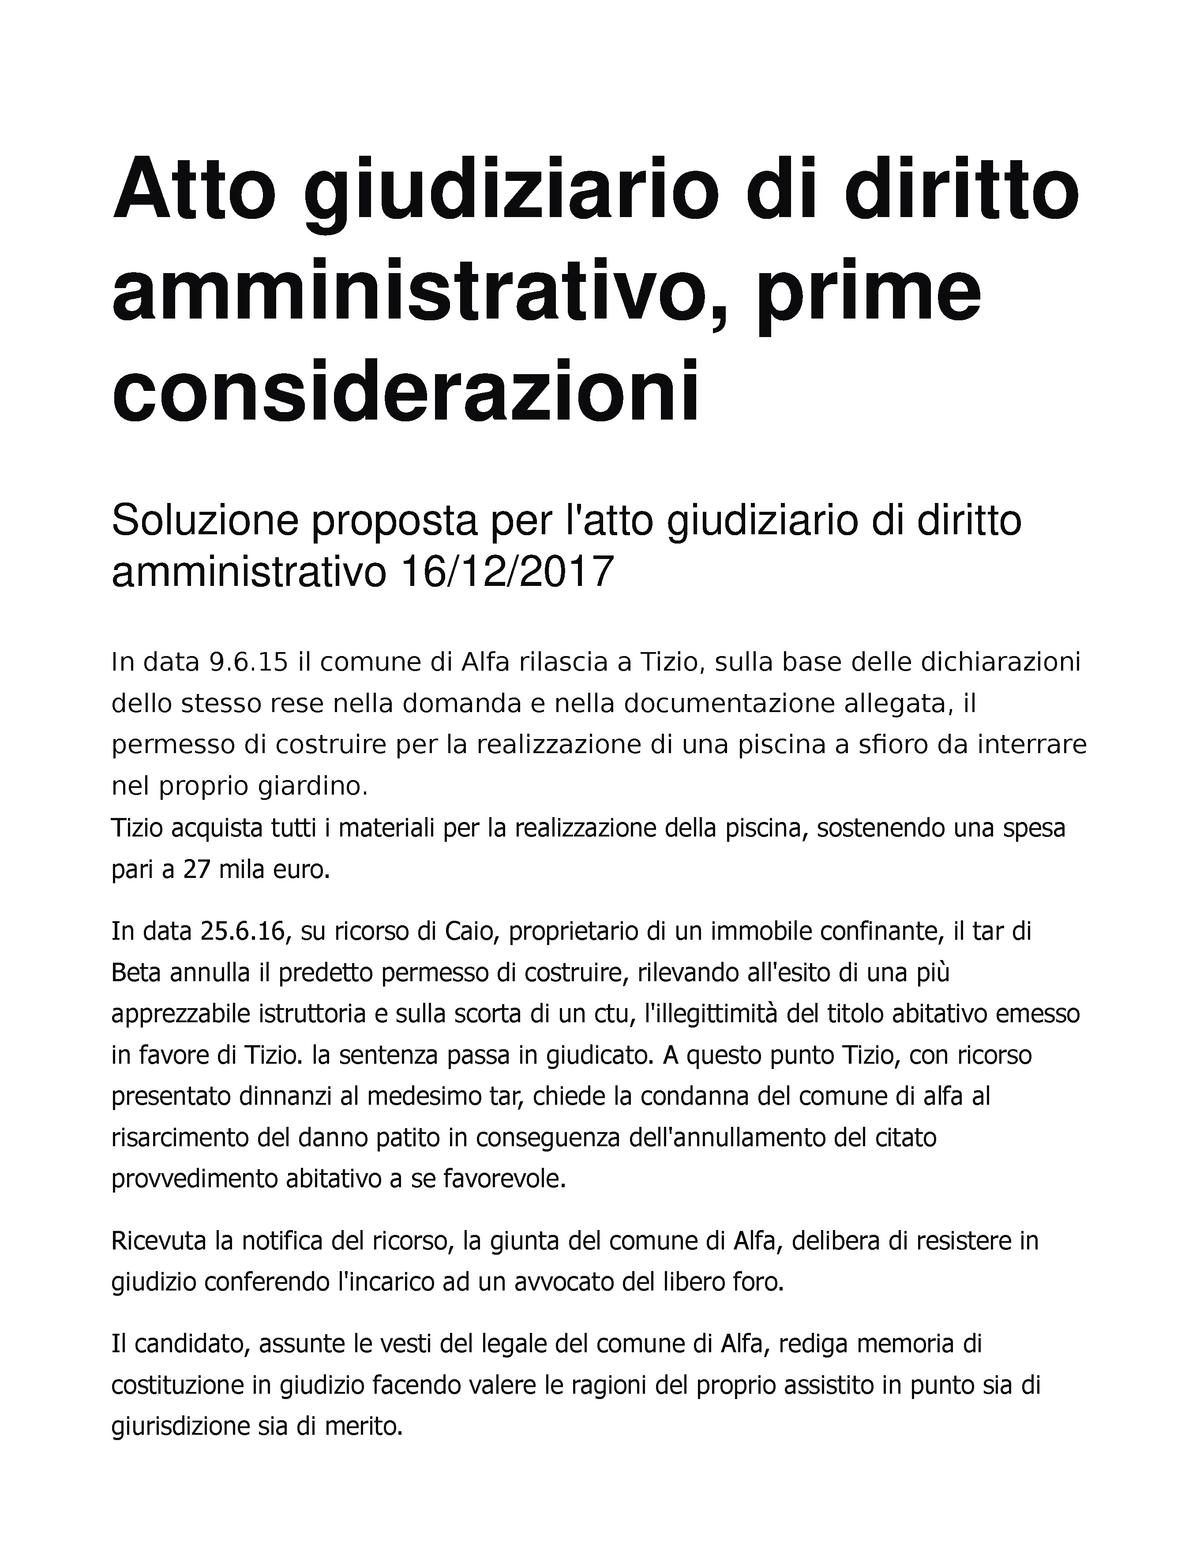 Diritto amministrativo - 00235: Diritto Amministrativo - StuDocu